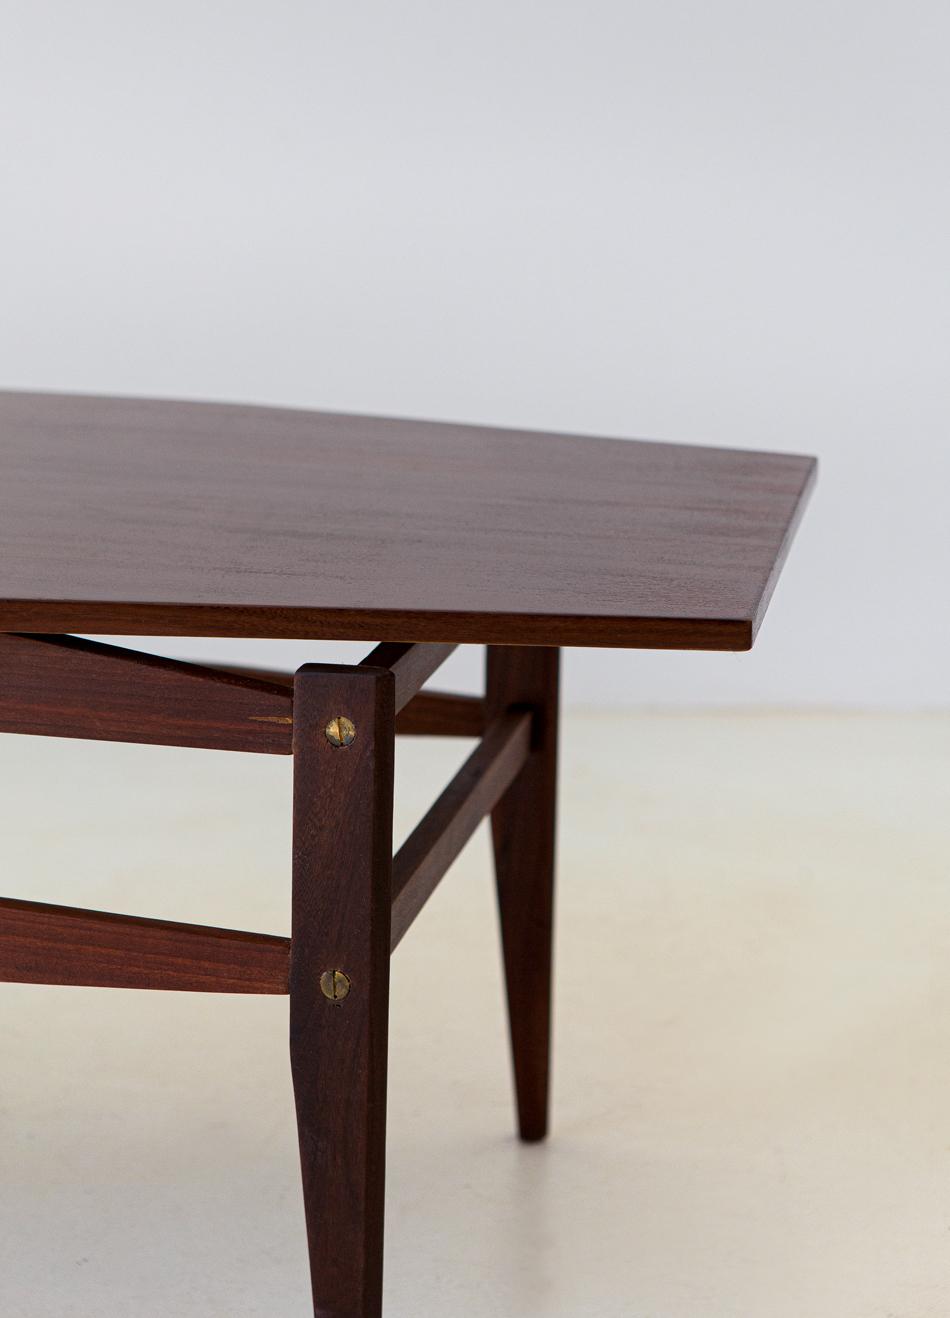 1950s-italian-modern-coffee-table-7-t90